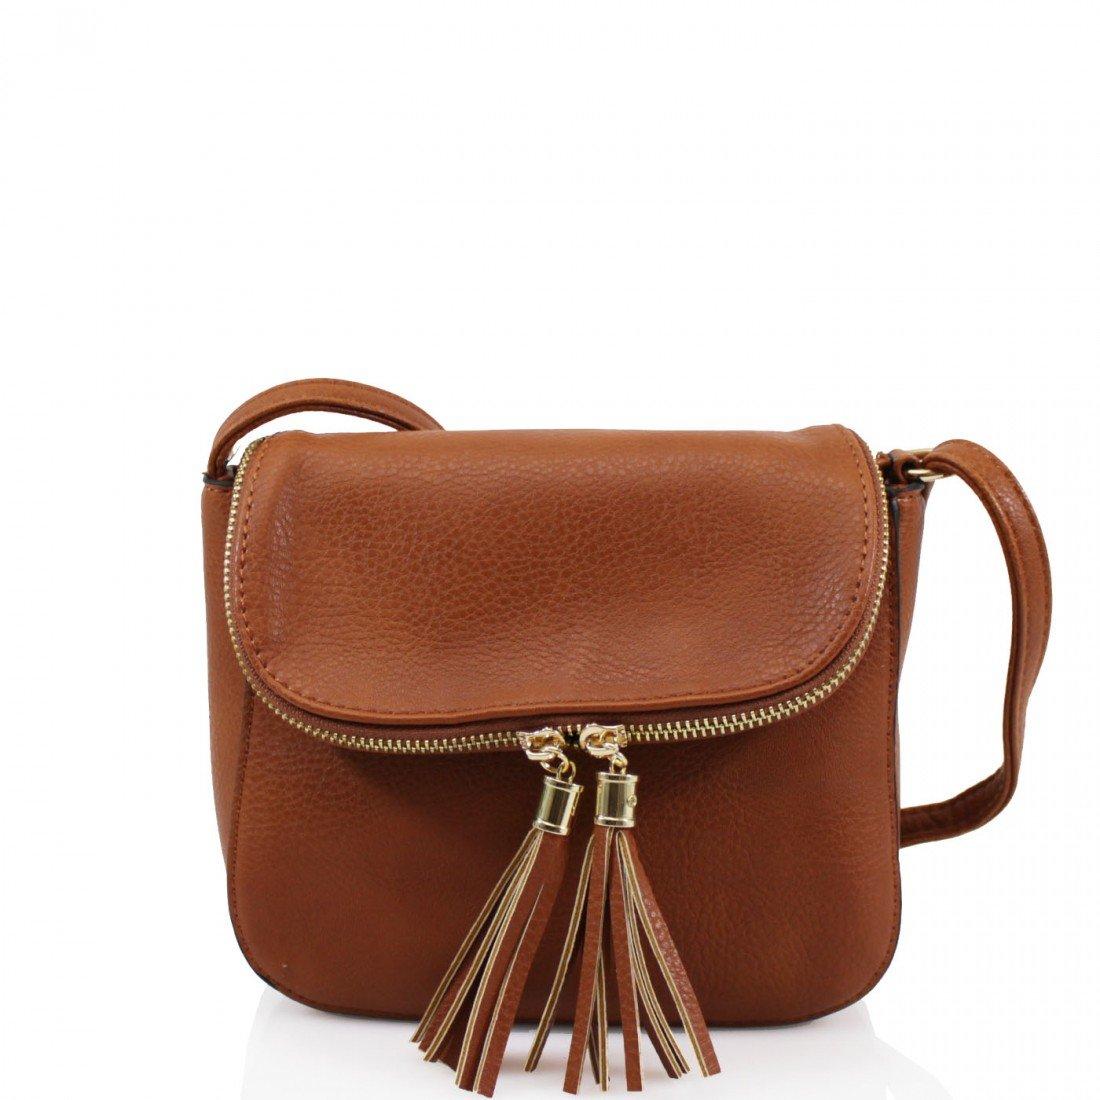 WKDS 2027 Ladies Tassel Adorned Small Cross Body Bags Women Girls Shoulder  Side Casual Bags (Beige): Amazon.co.uk: Shoes & Bags